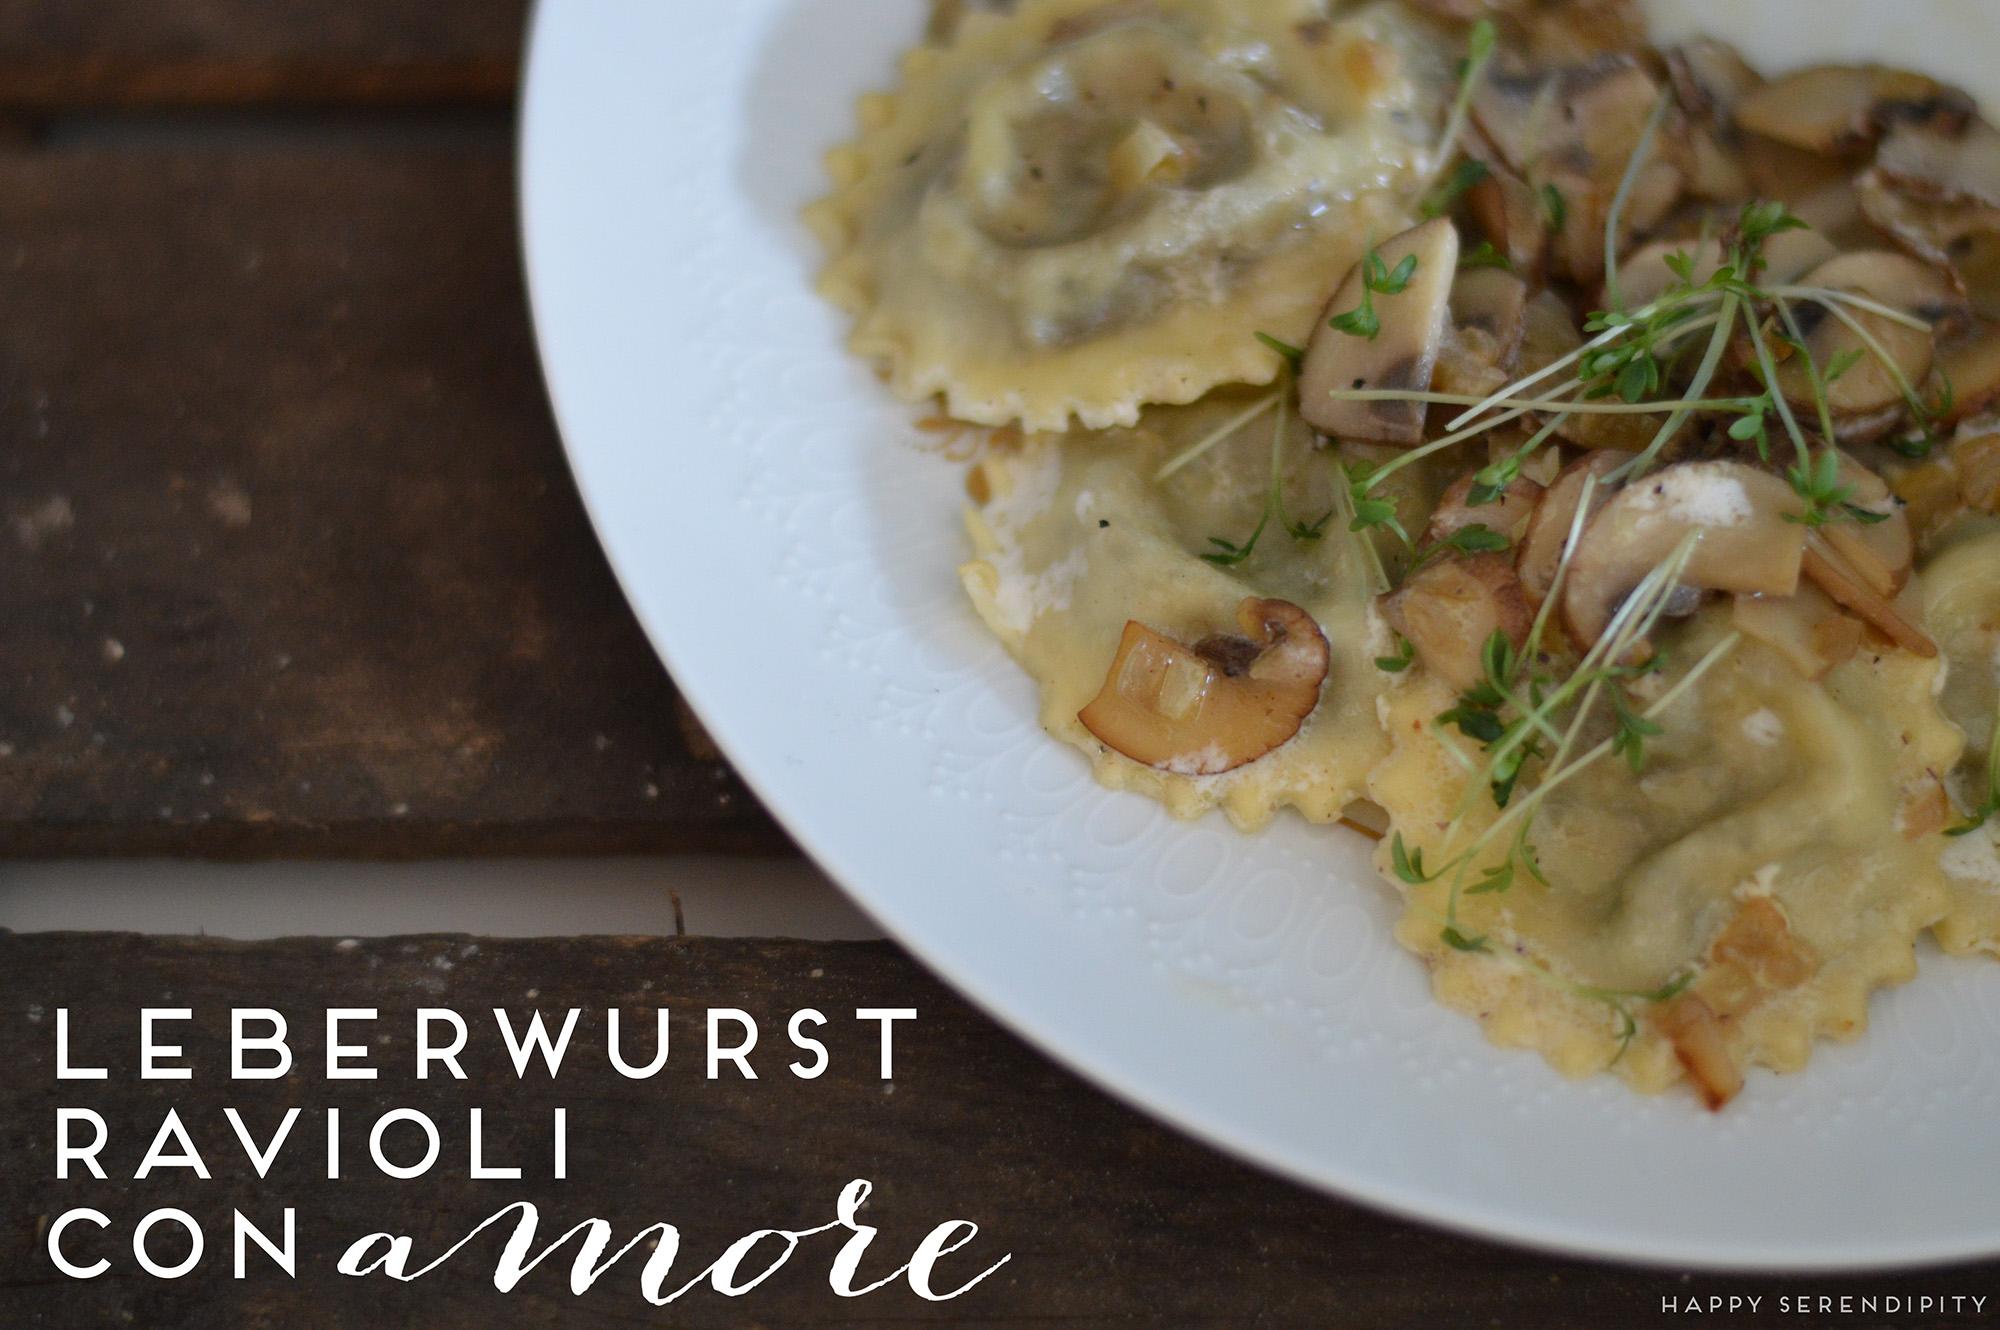 leberwurst raviolicon amore